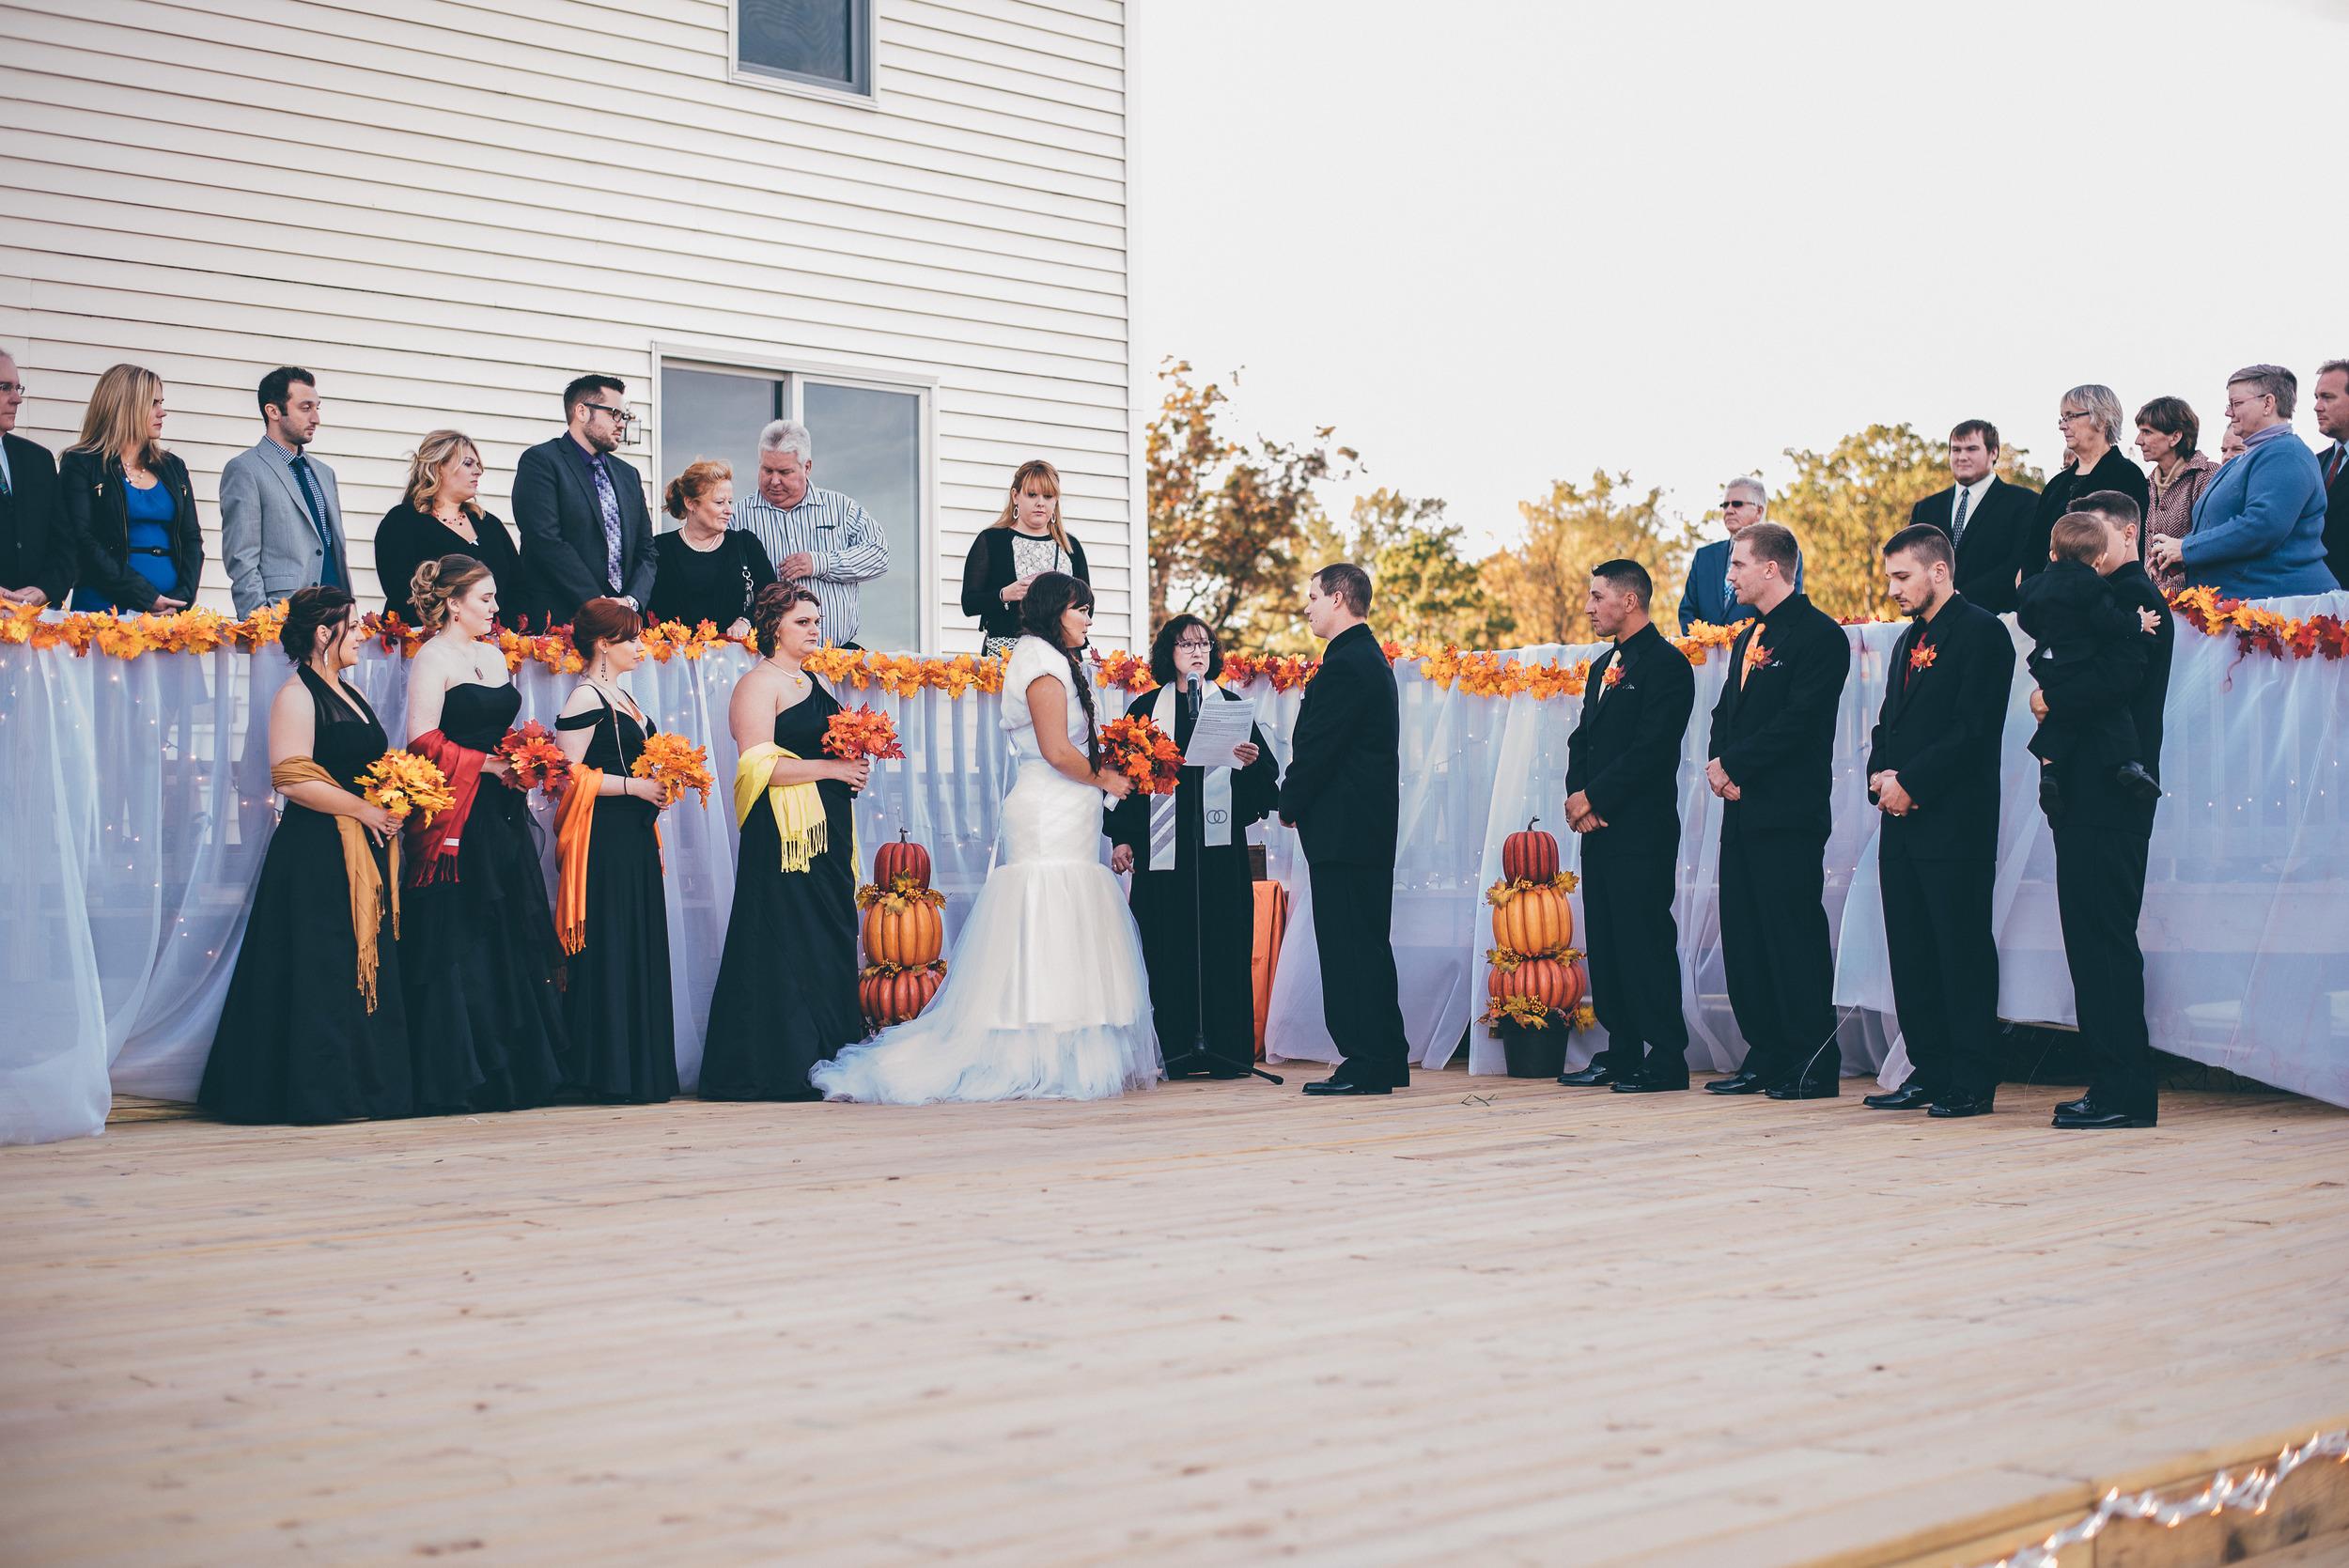 ceremony (44 of 213).JPG